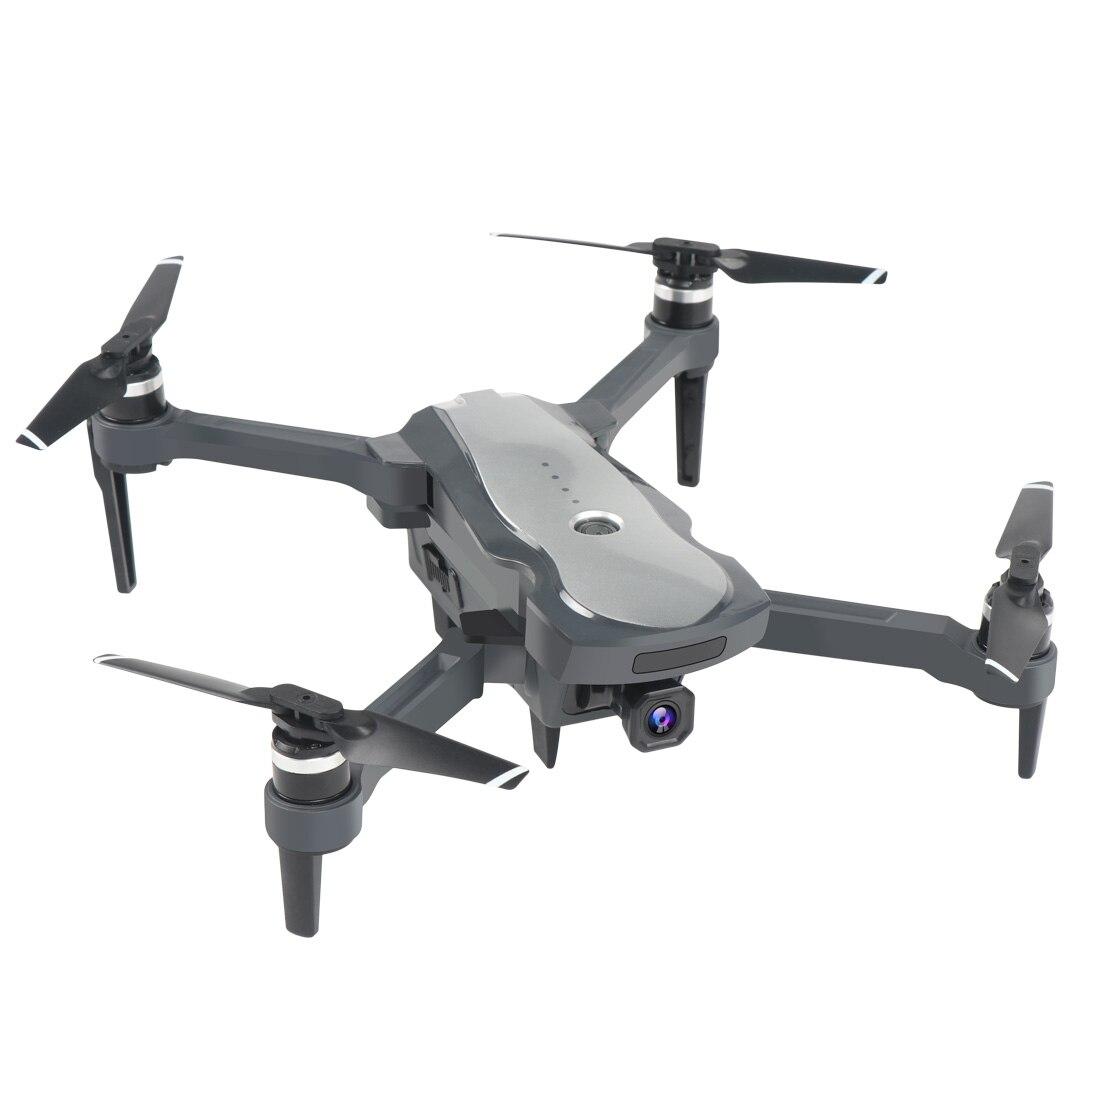 Wifi FPV 4K GPS Drone K20 5G HD Dual Camera ESC Brushless Motor Professional Foldable RC Quadcopter 25 Mins Flight Toys VS SG907 (Grey 4K 1B Bag)